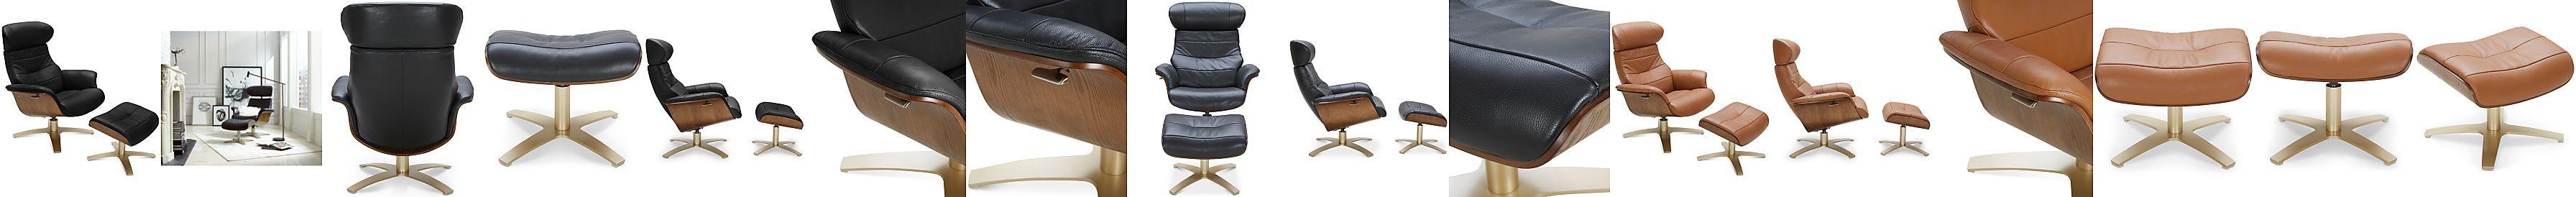 Annaldo Leather Swivel Chair Amp Ottoman 2 Pc Set Leather